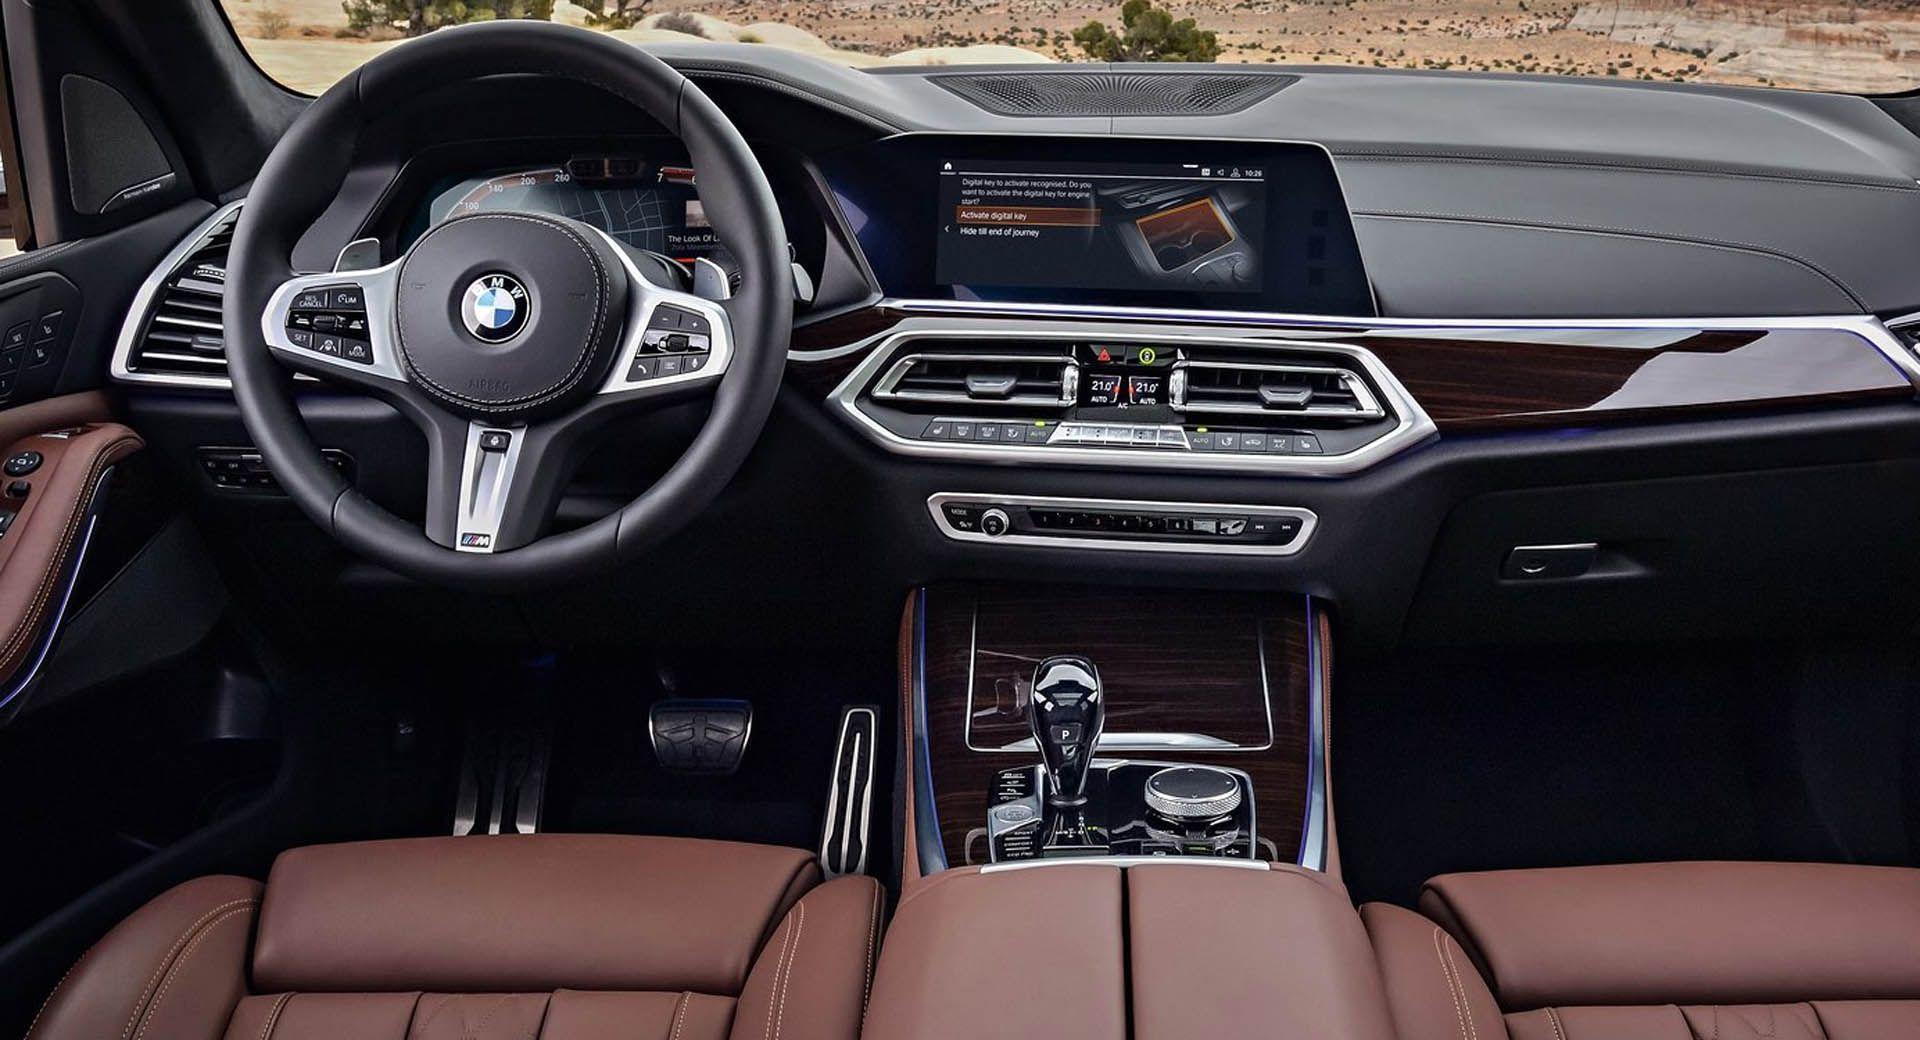 BMW-X5-G05-2019-6.jpg